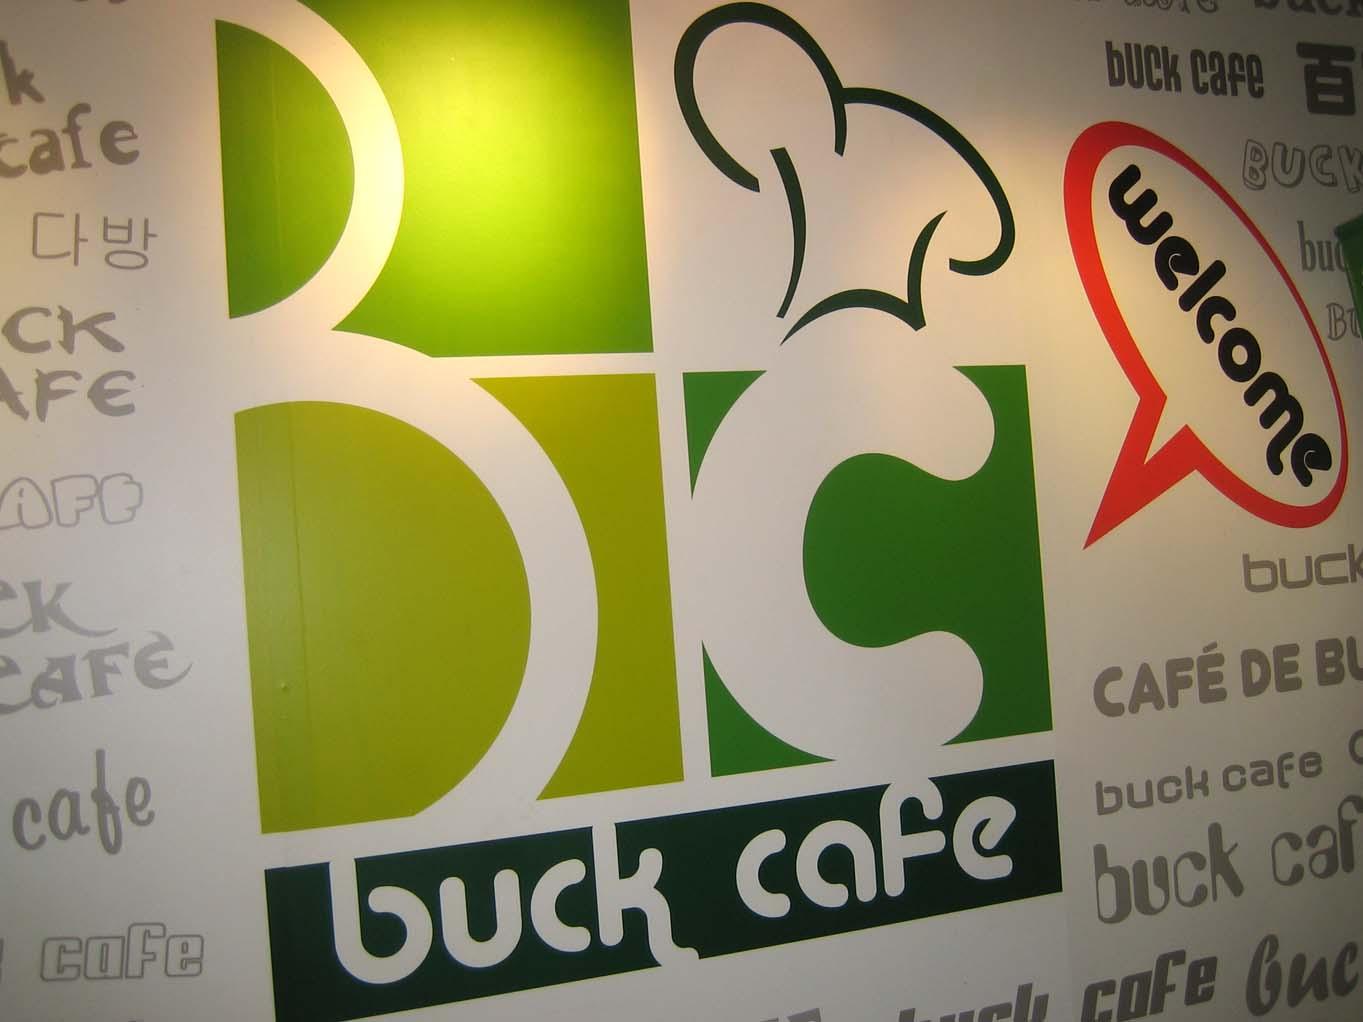 Buck Cafe